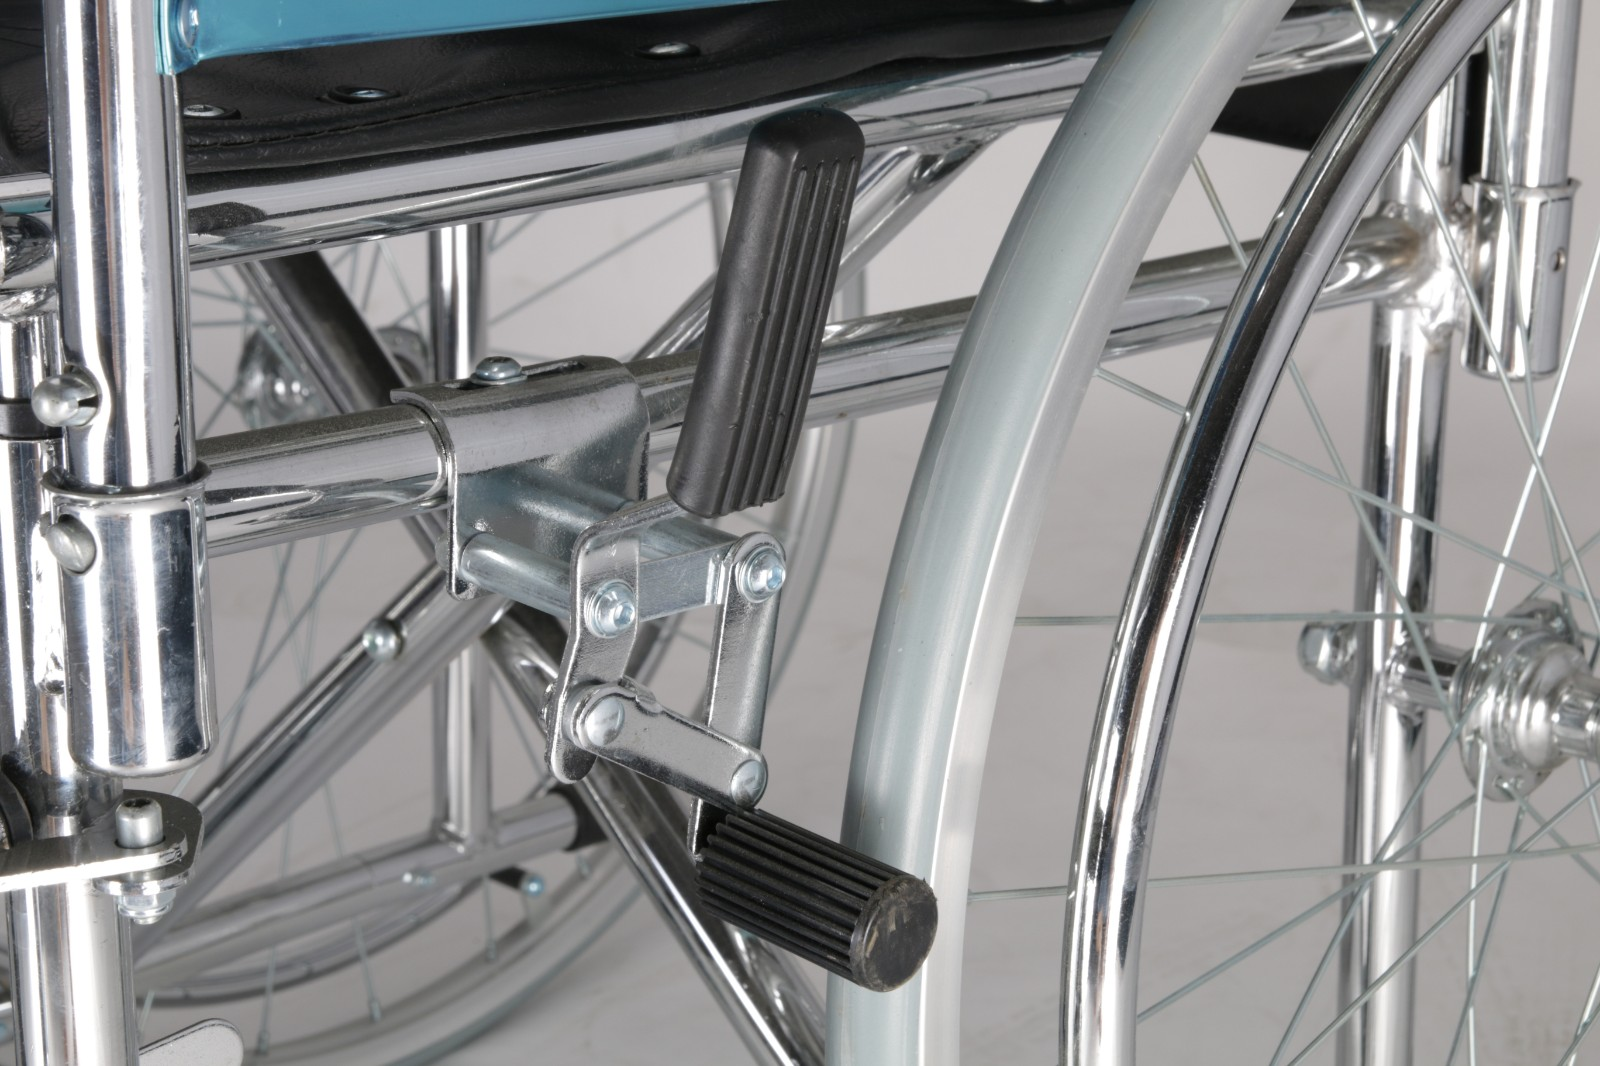 portable steel self propel wheelchair